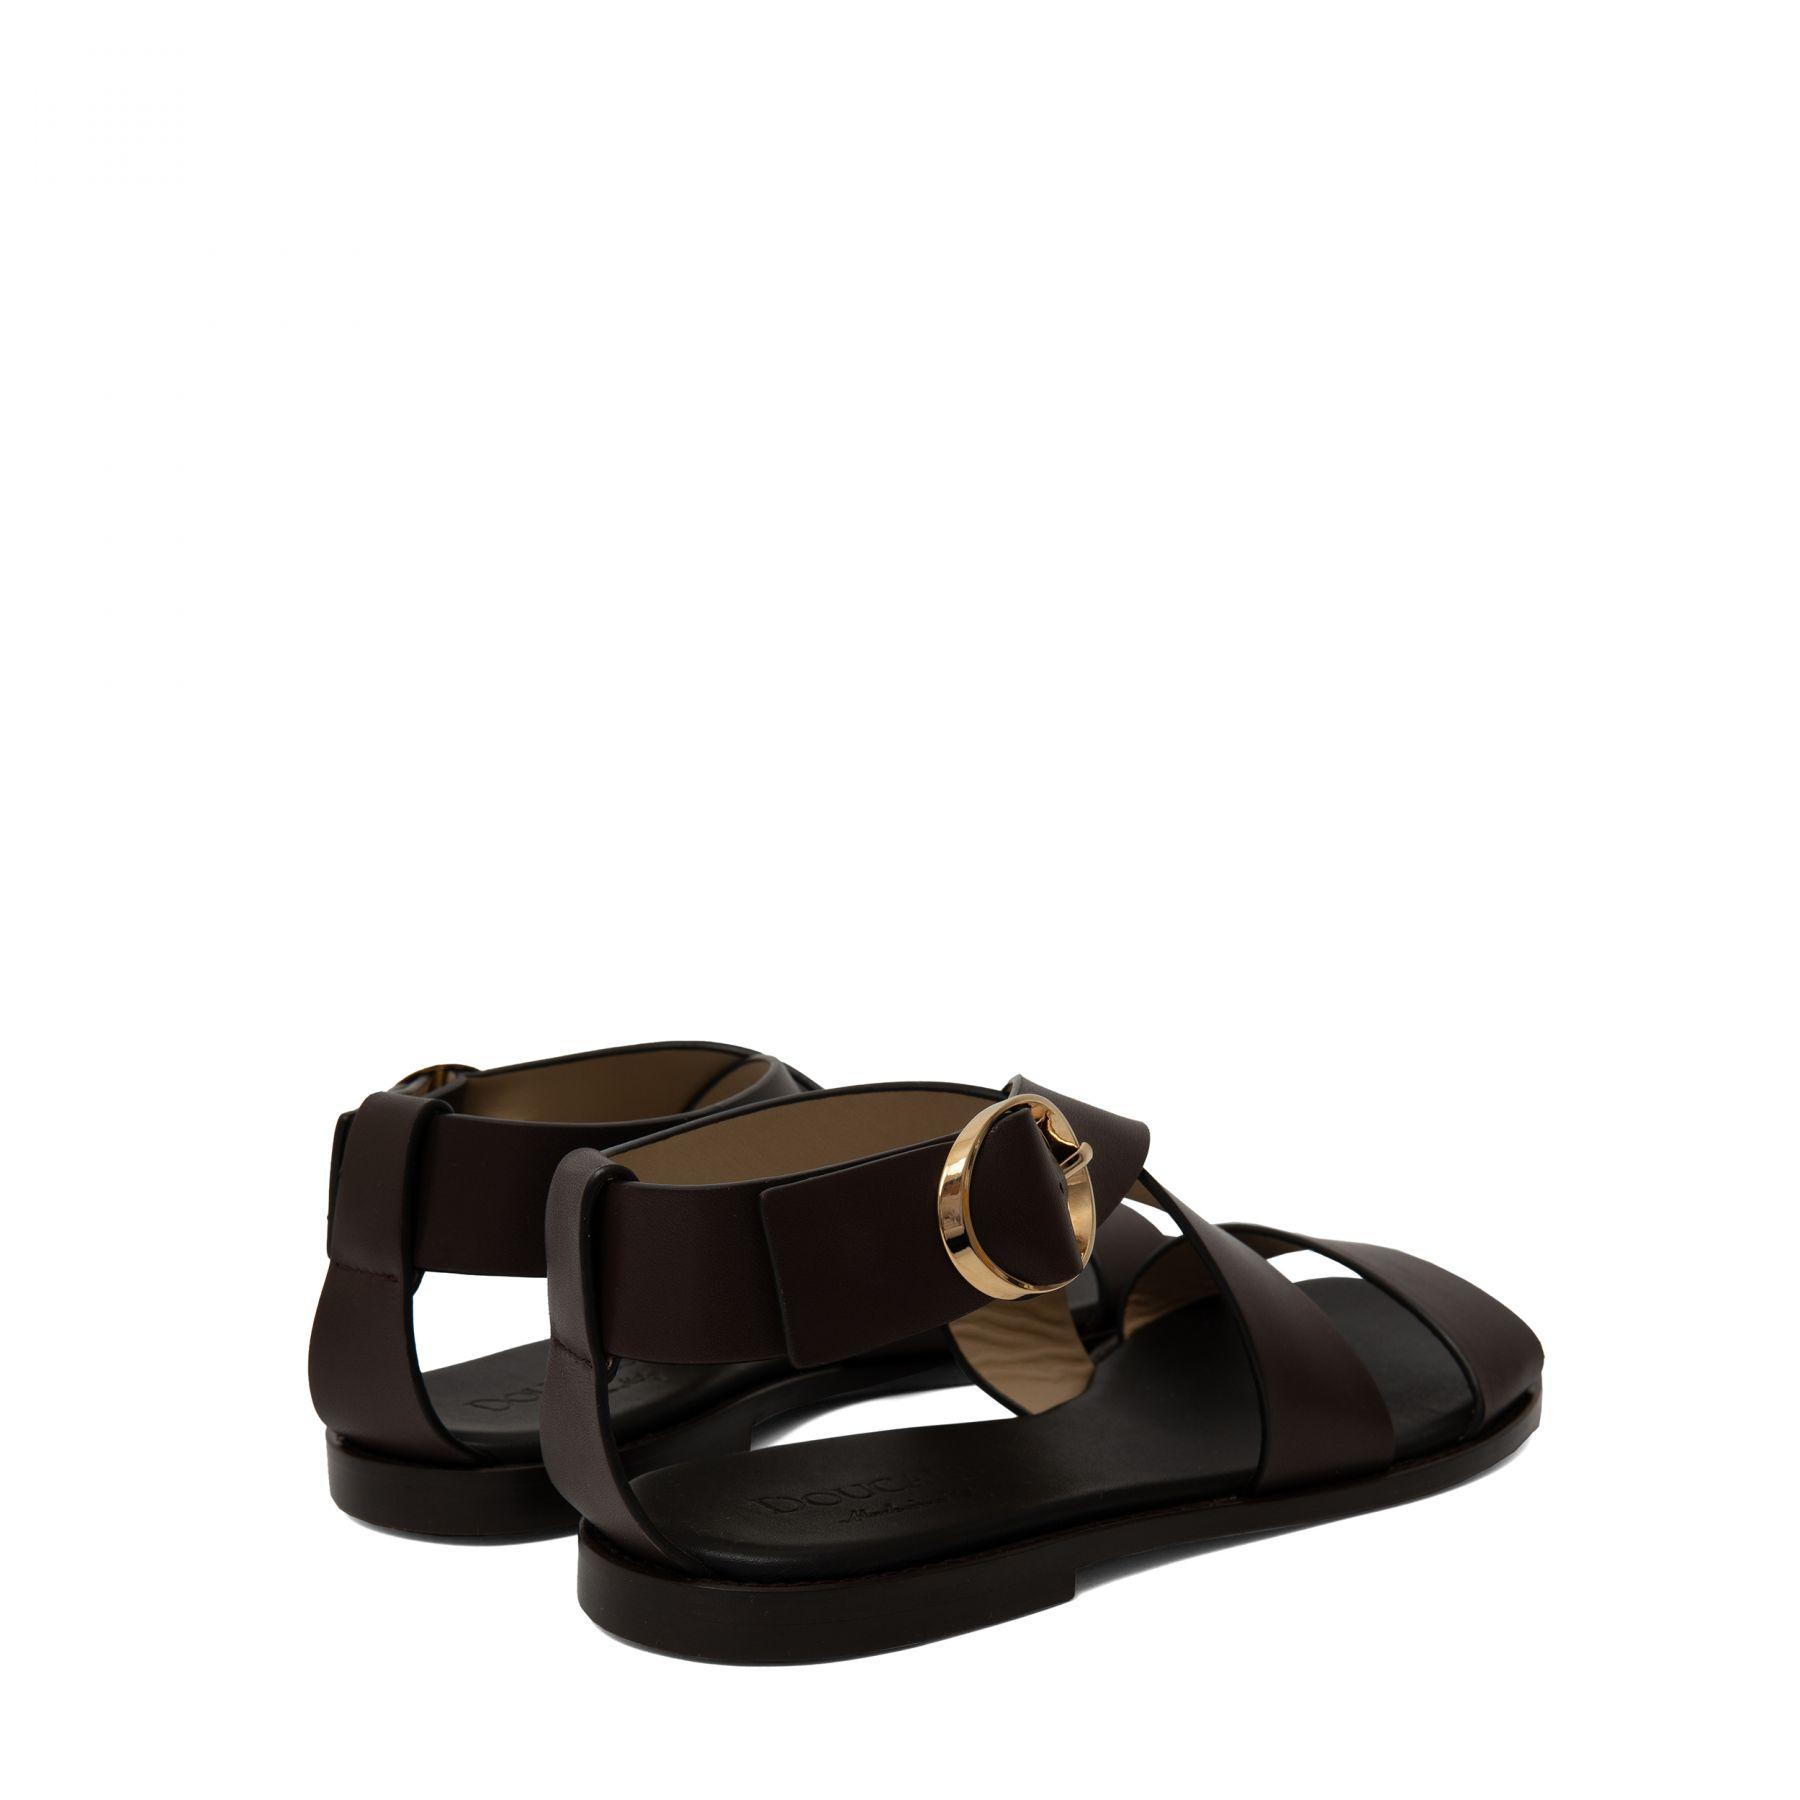 Сандалии Doucal's темно-коричневые